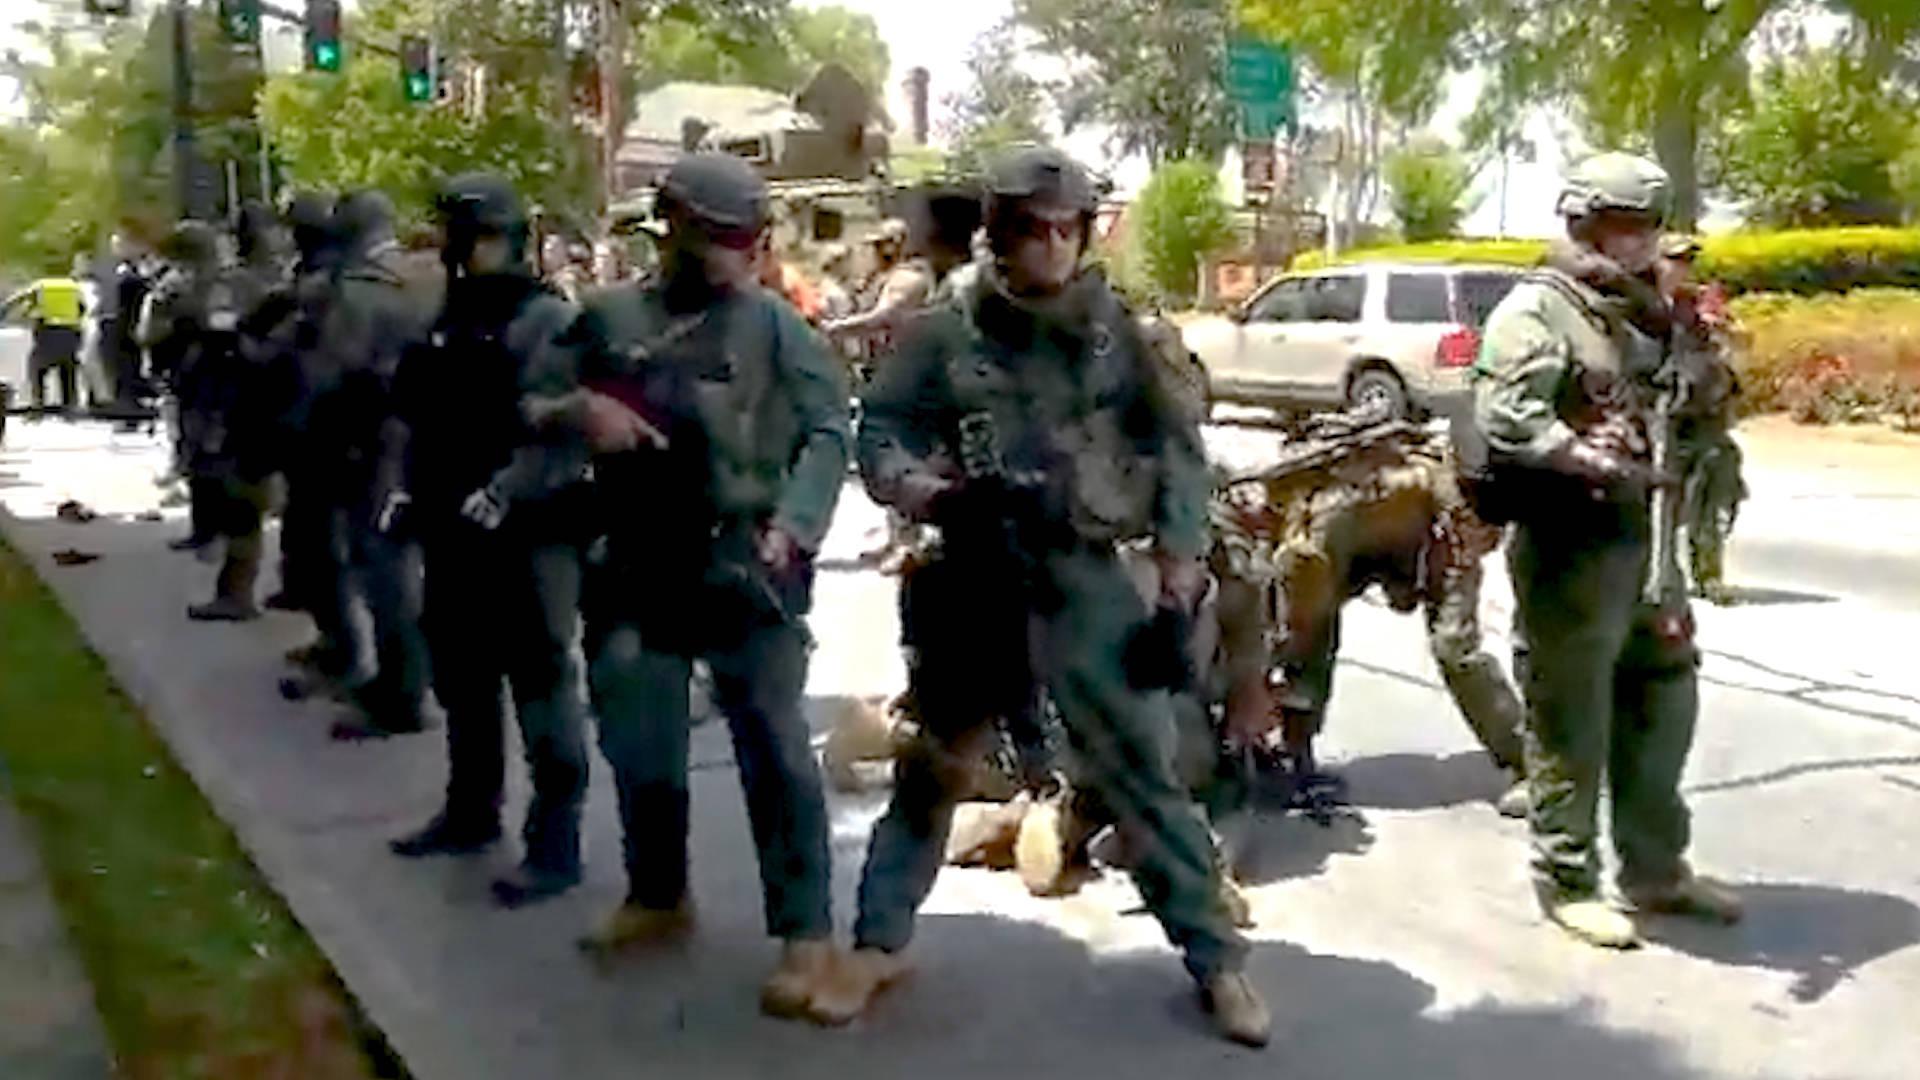 Pa Gun Shows >> Georgia: Police Arrest 10 Anti-Fascist Protesters as Neo ...